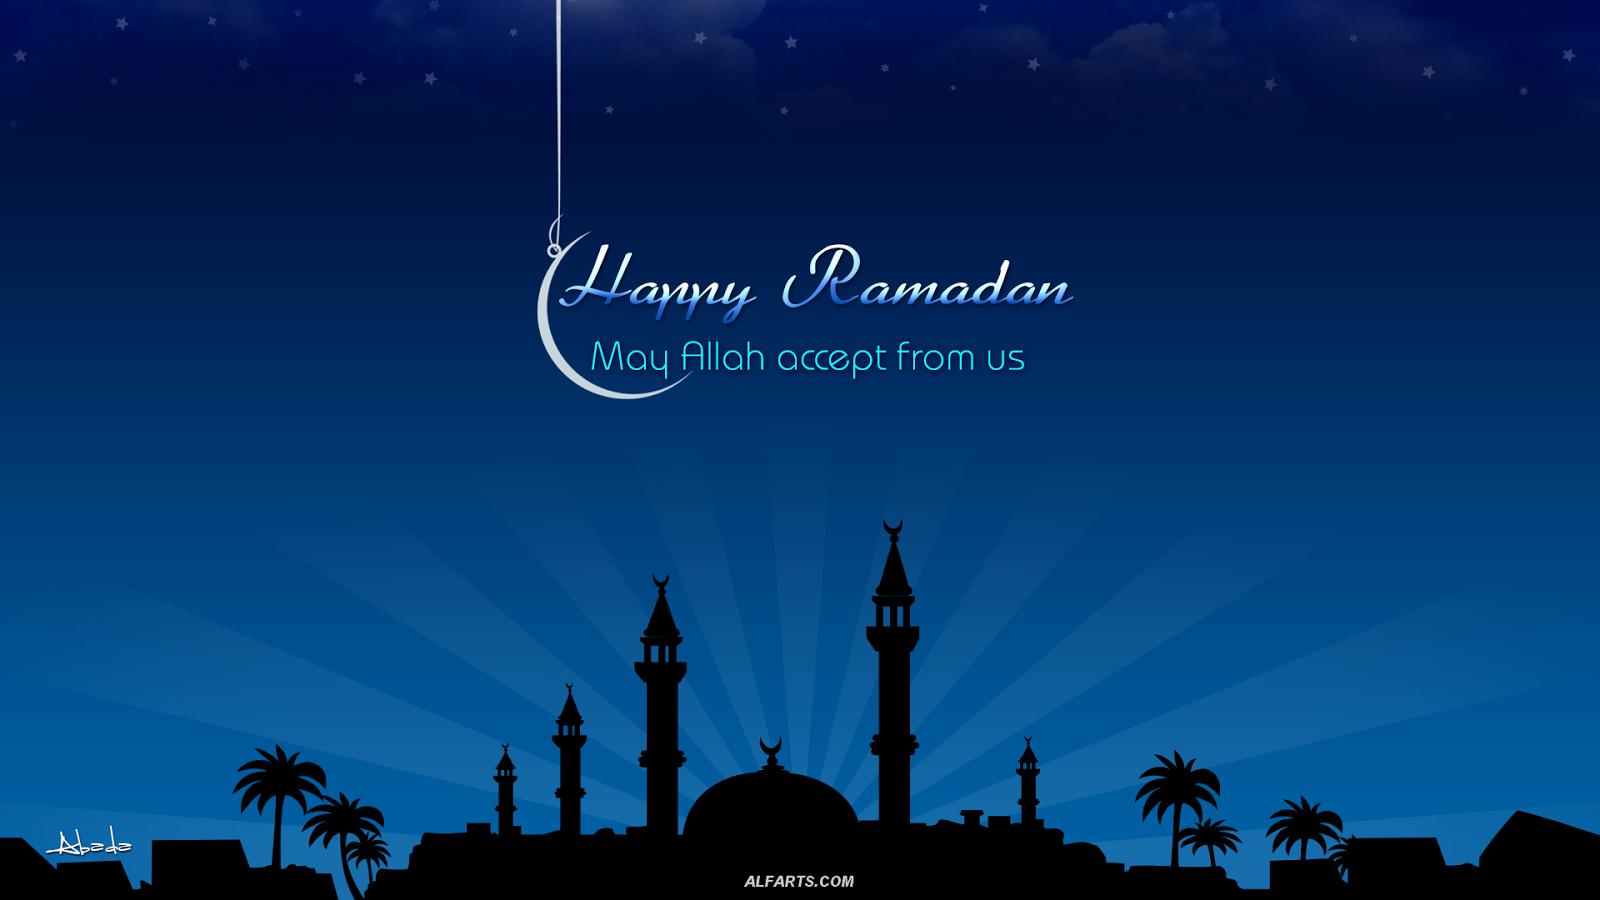 Kumpulan gambar menyambut ramadhan 2017 m 1438 h apk 4 fun